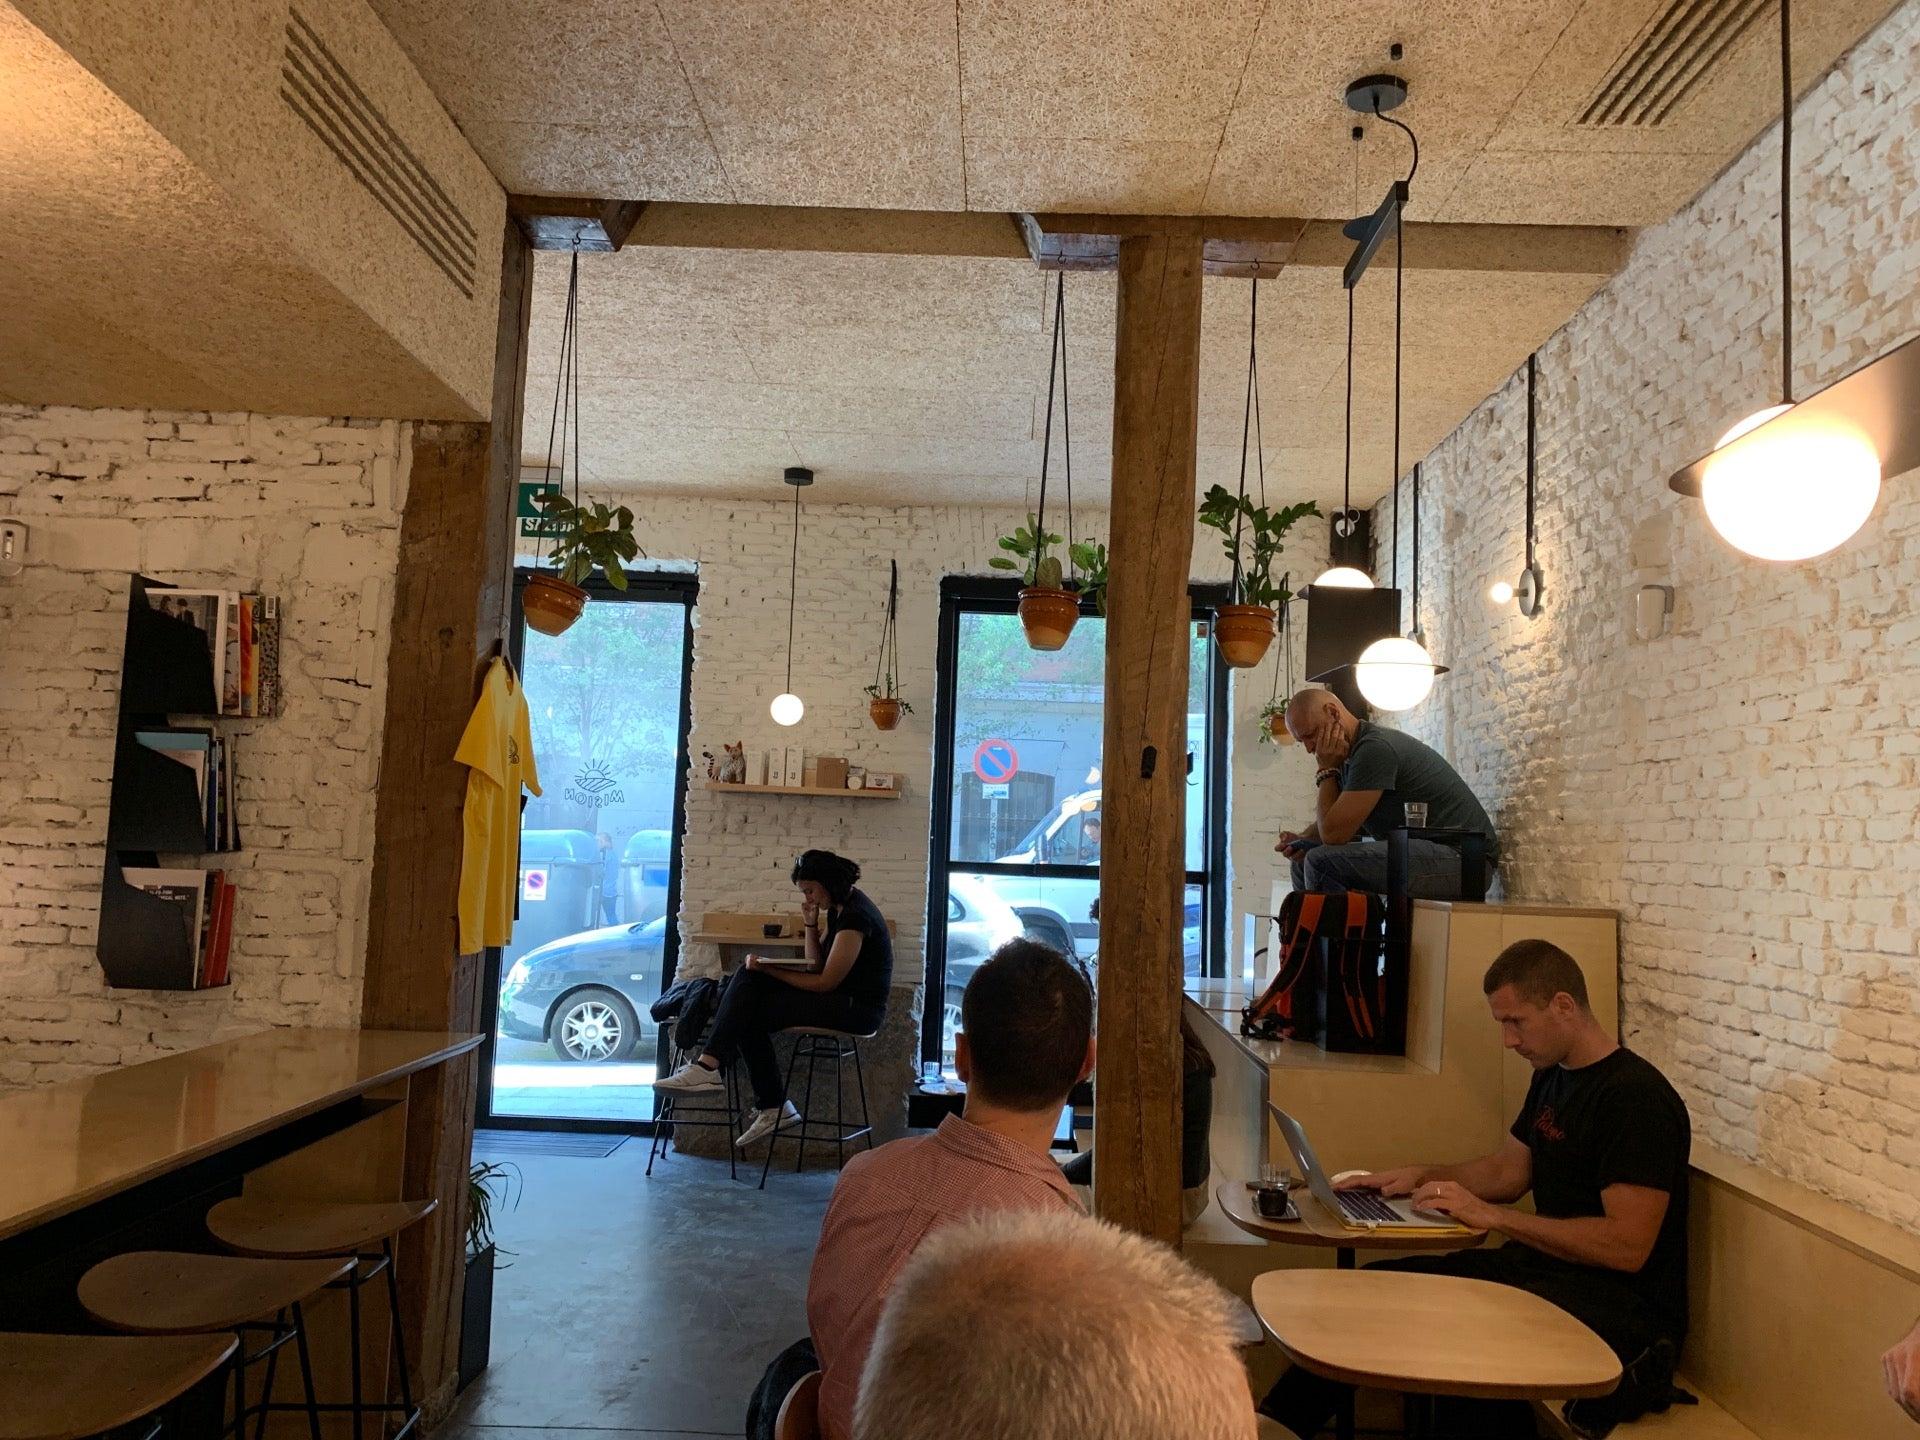 Checked in at Misión Café